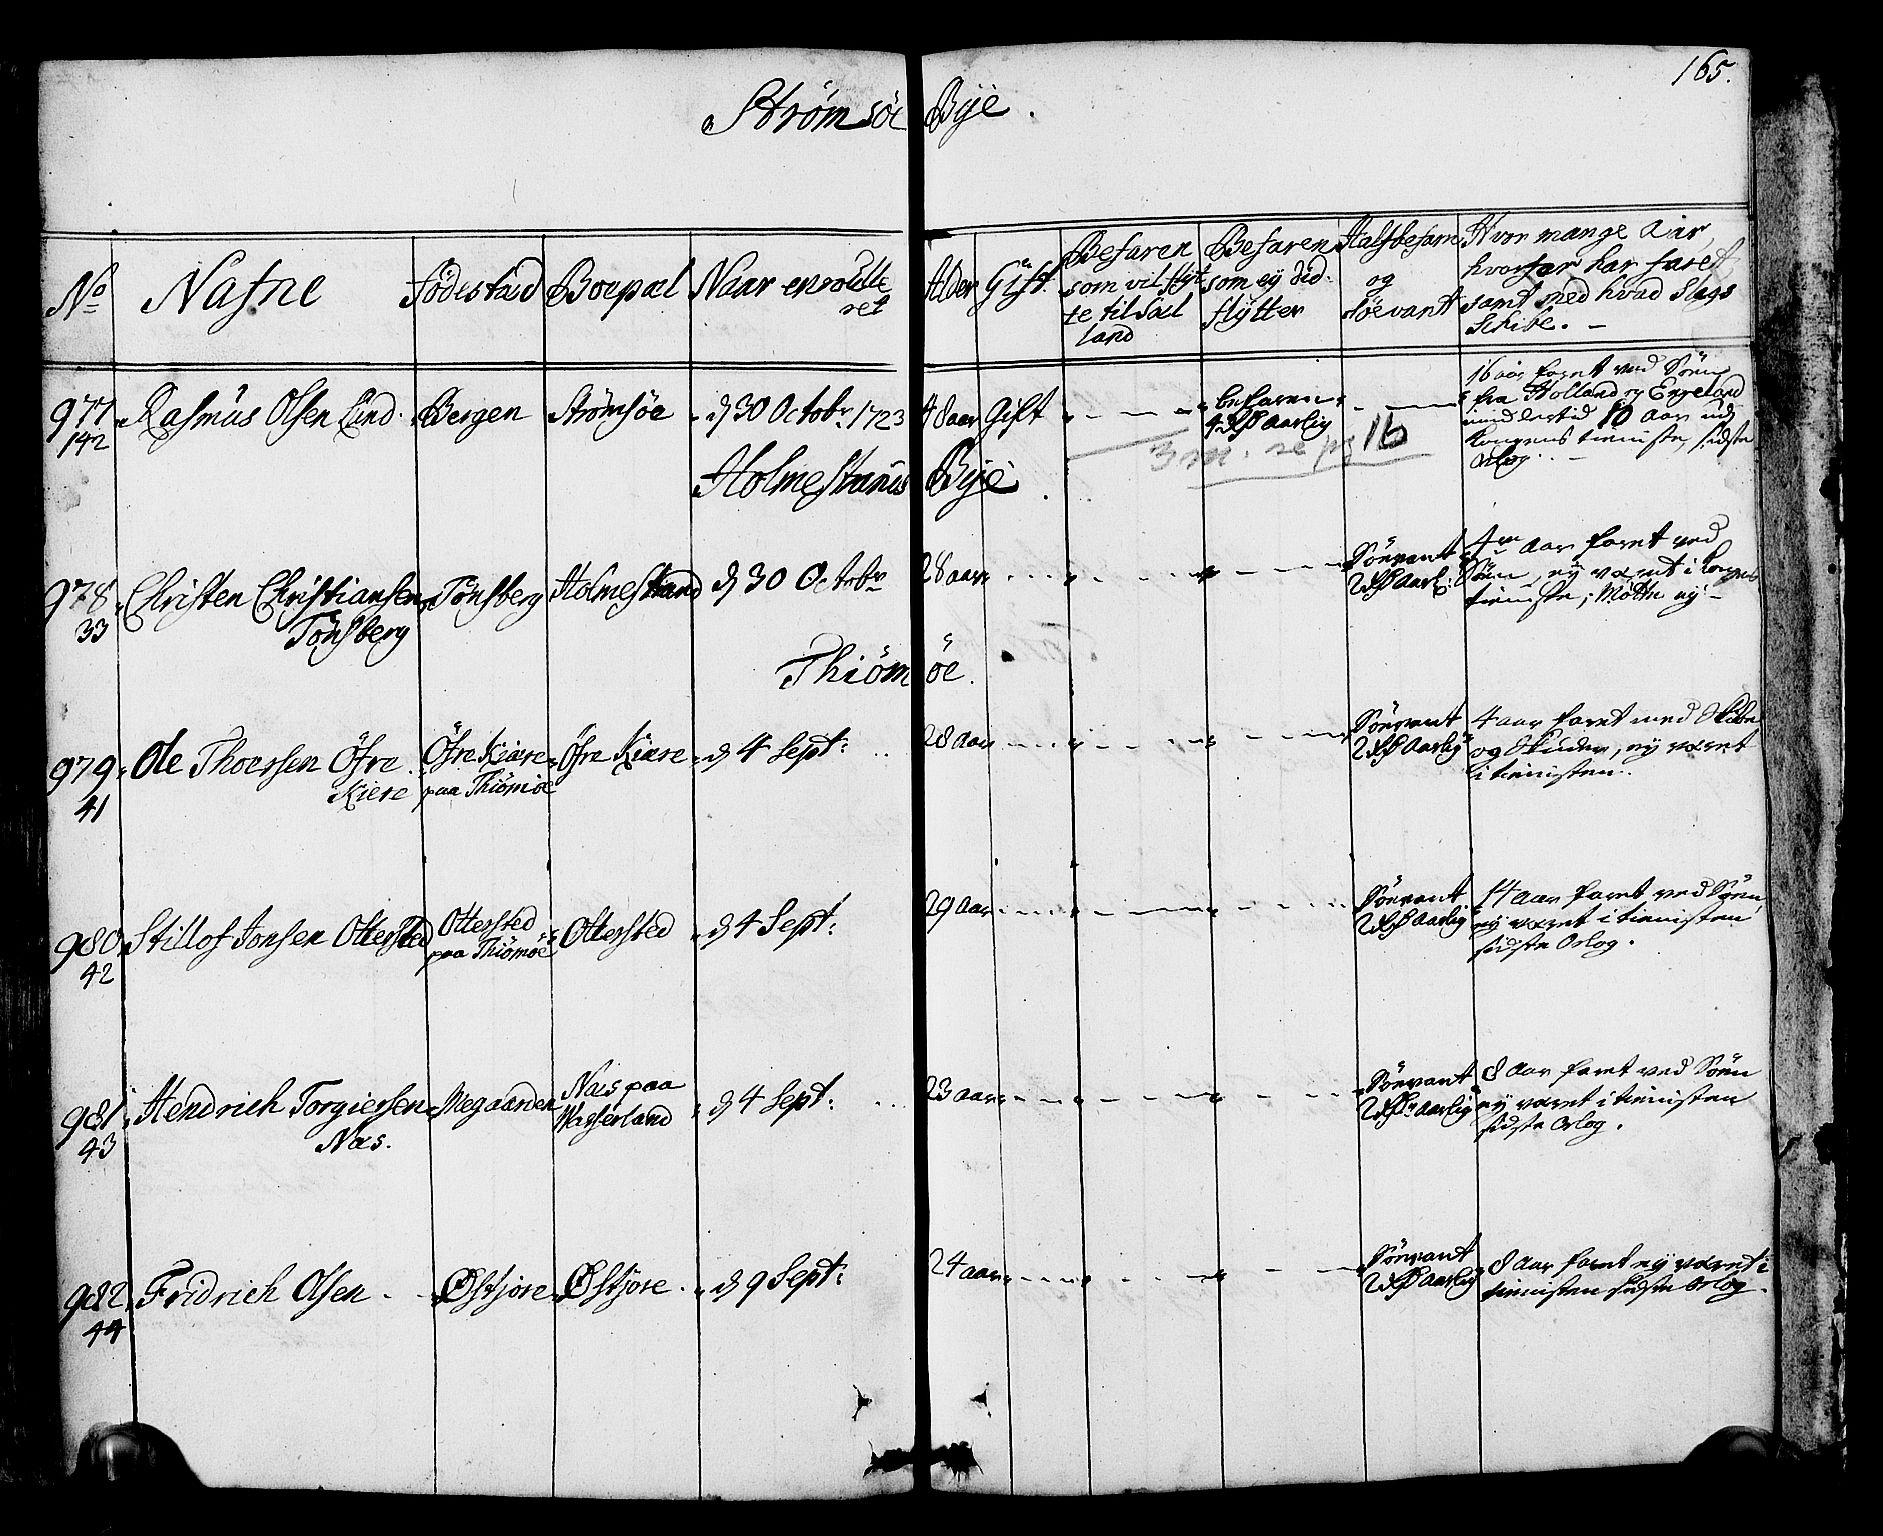 SAKO, Drammen innrulleringsdistrikt, F/Fa/L0002: Hovedrulle, 1723-1726, p. 166